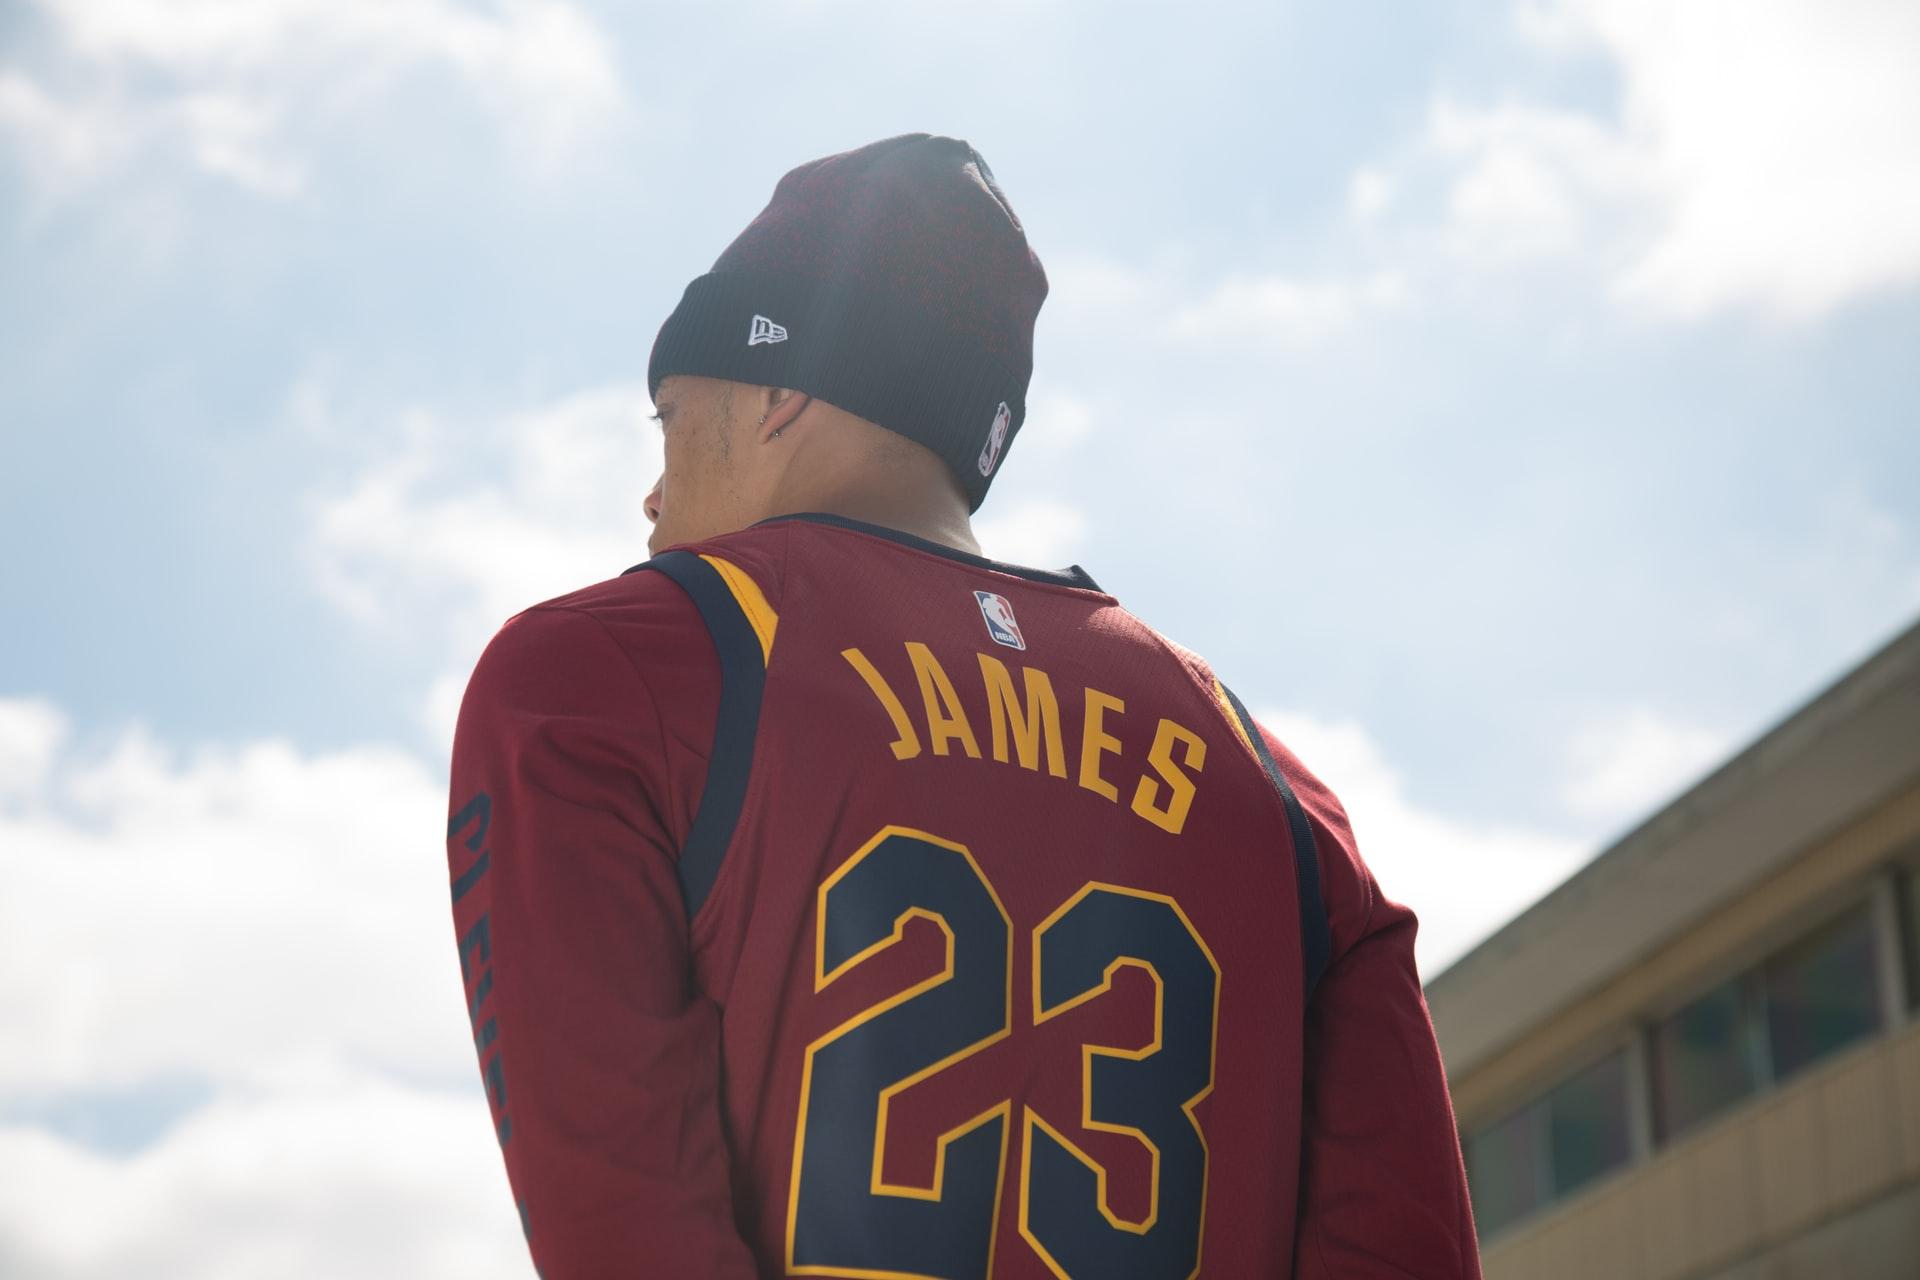 LeBron James fan